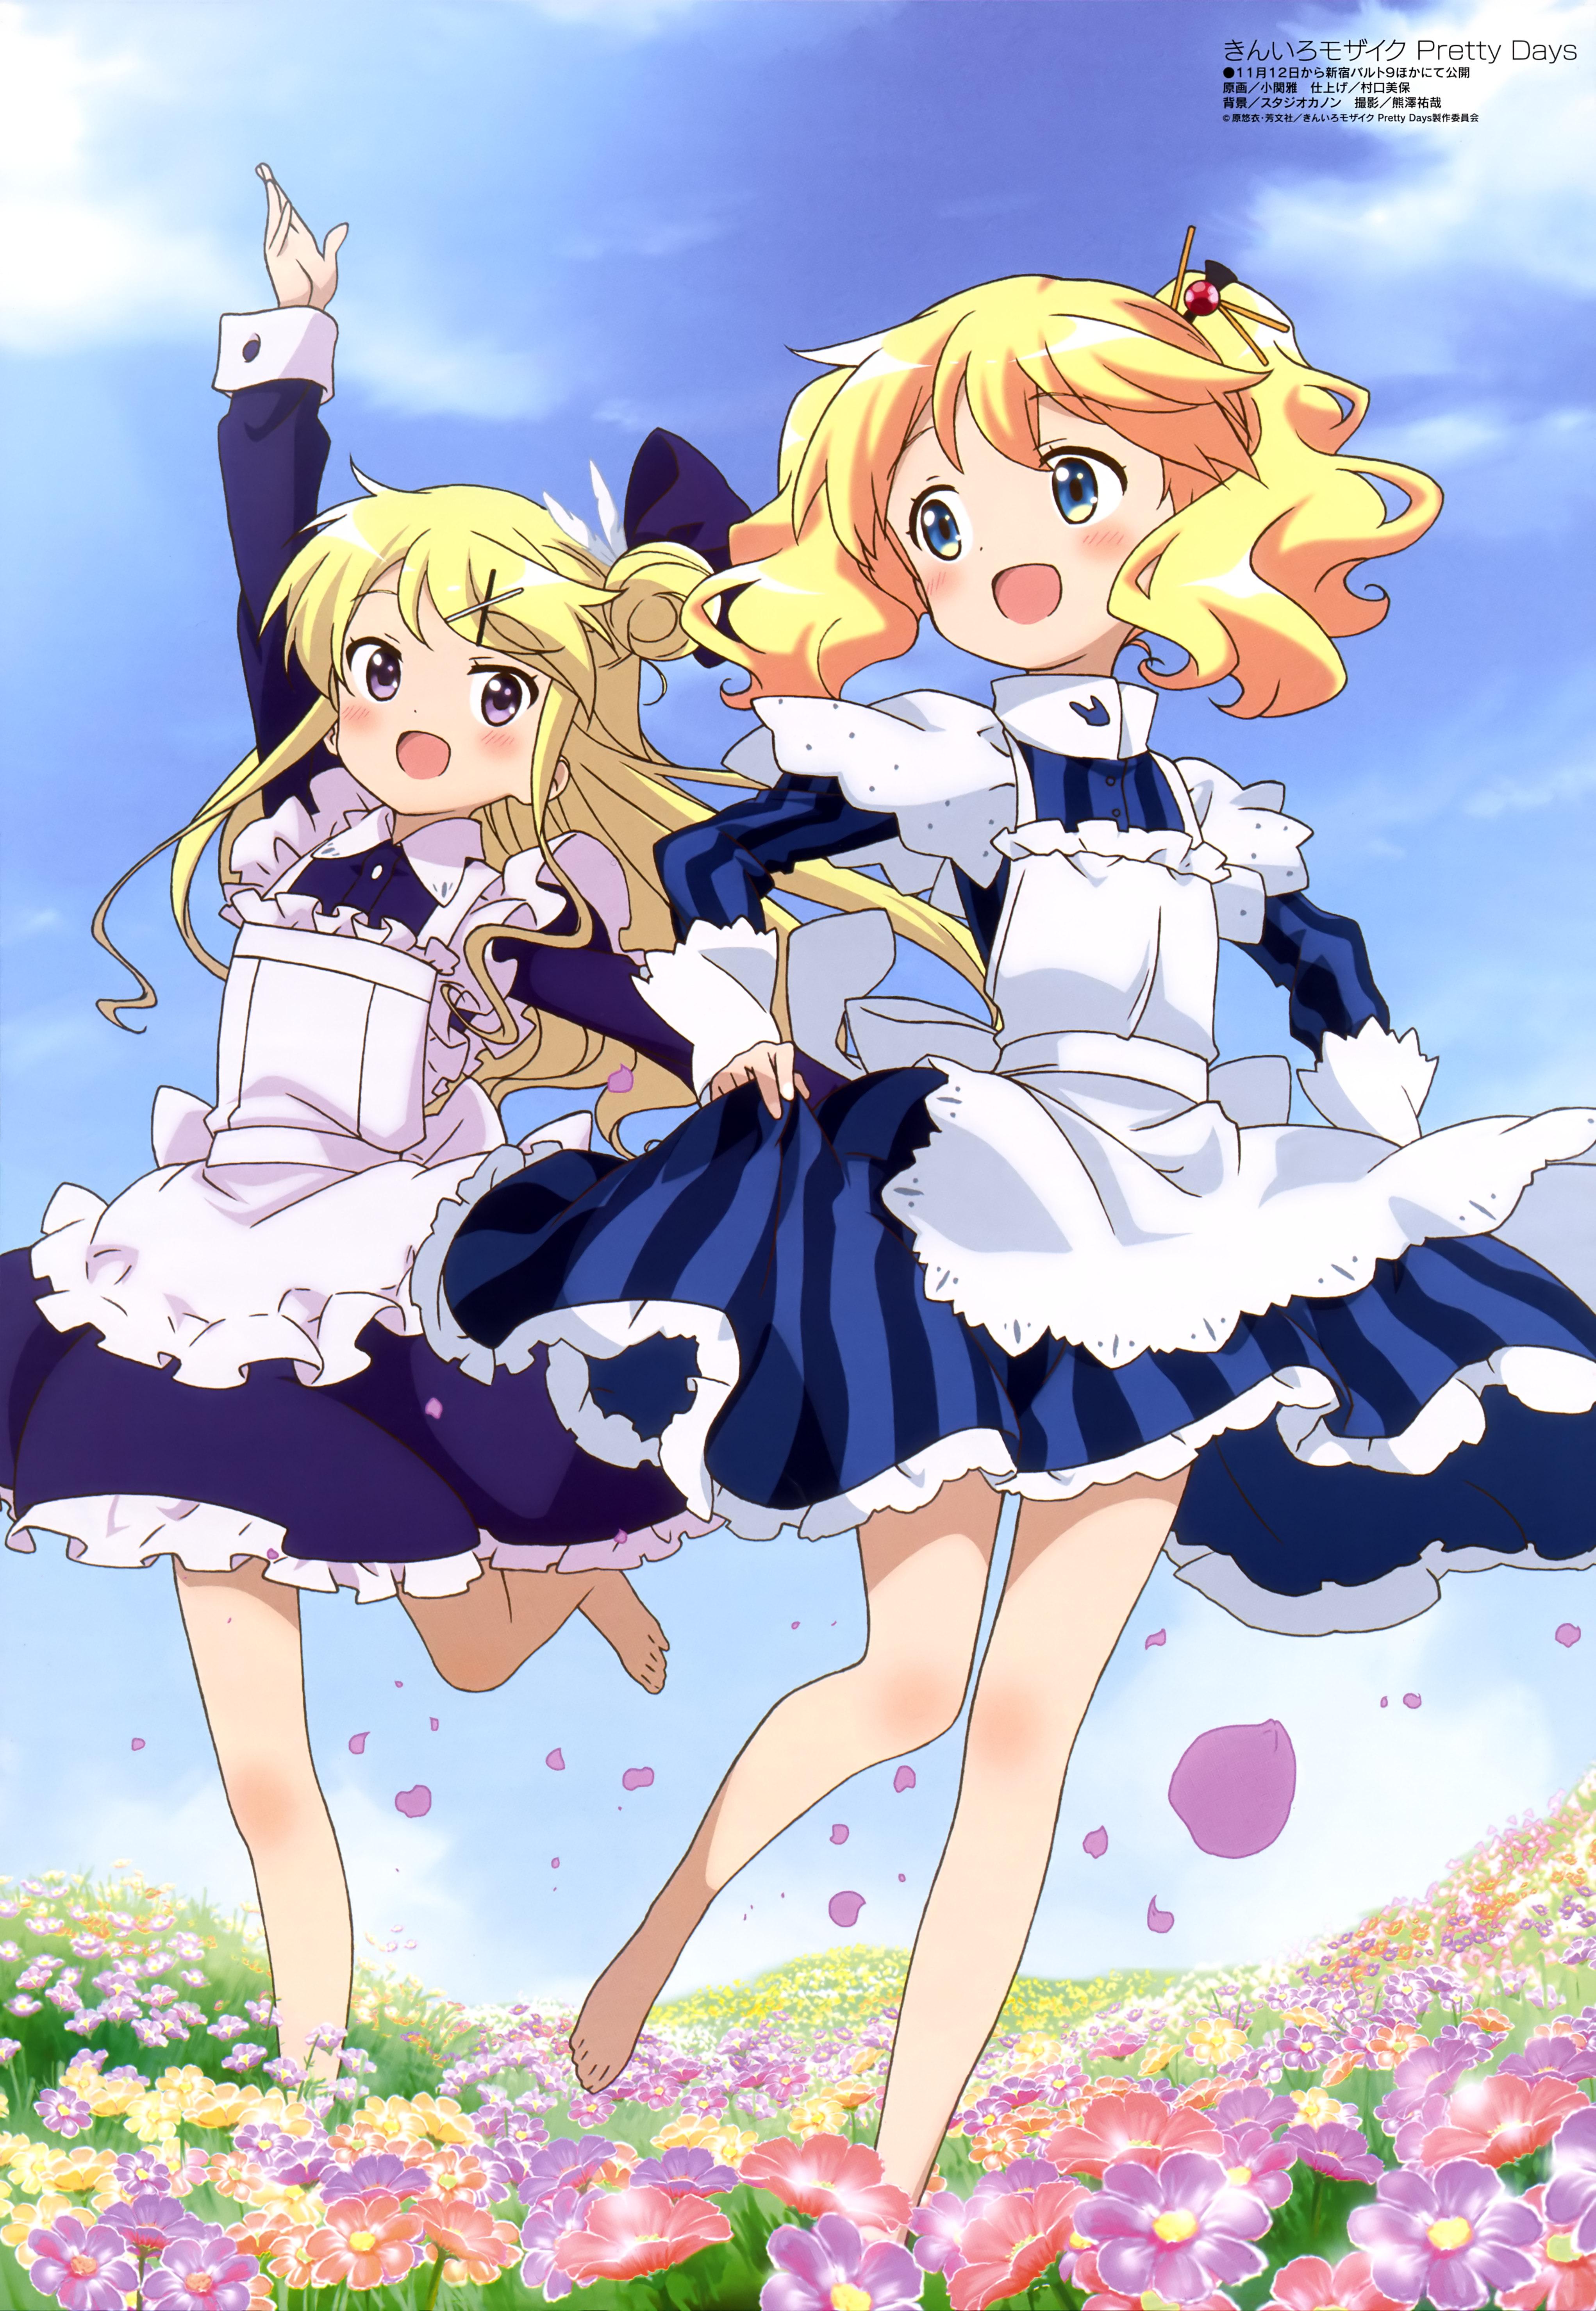 megami-magazine-december-2016-anime-poster-kiniro-mosaic